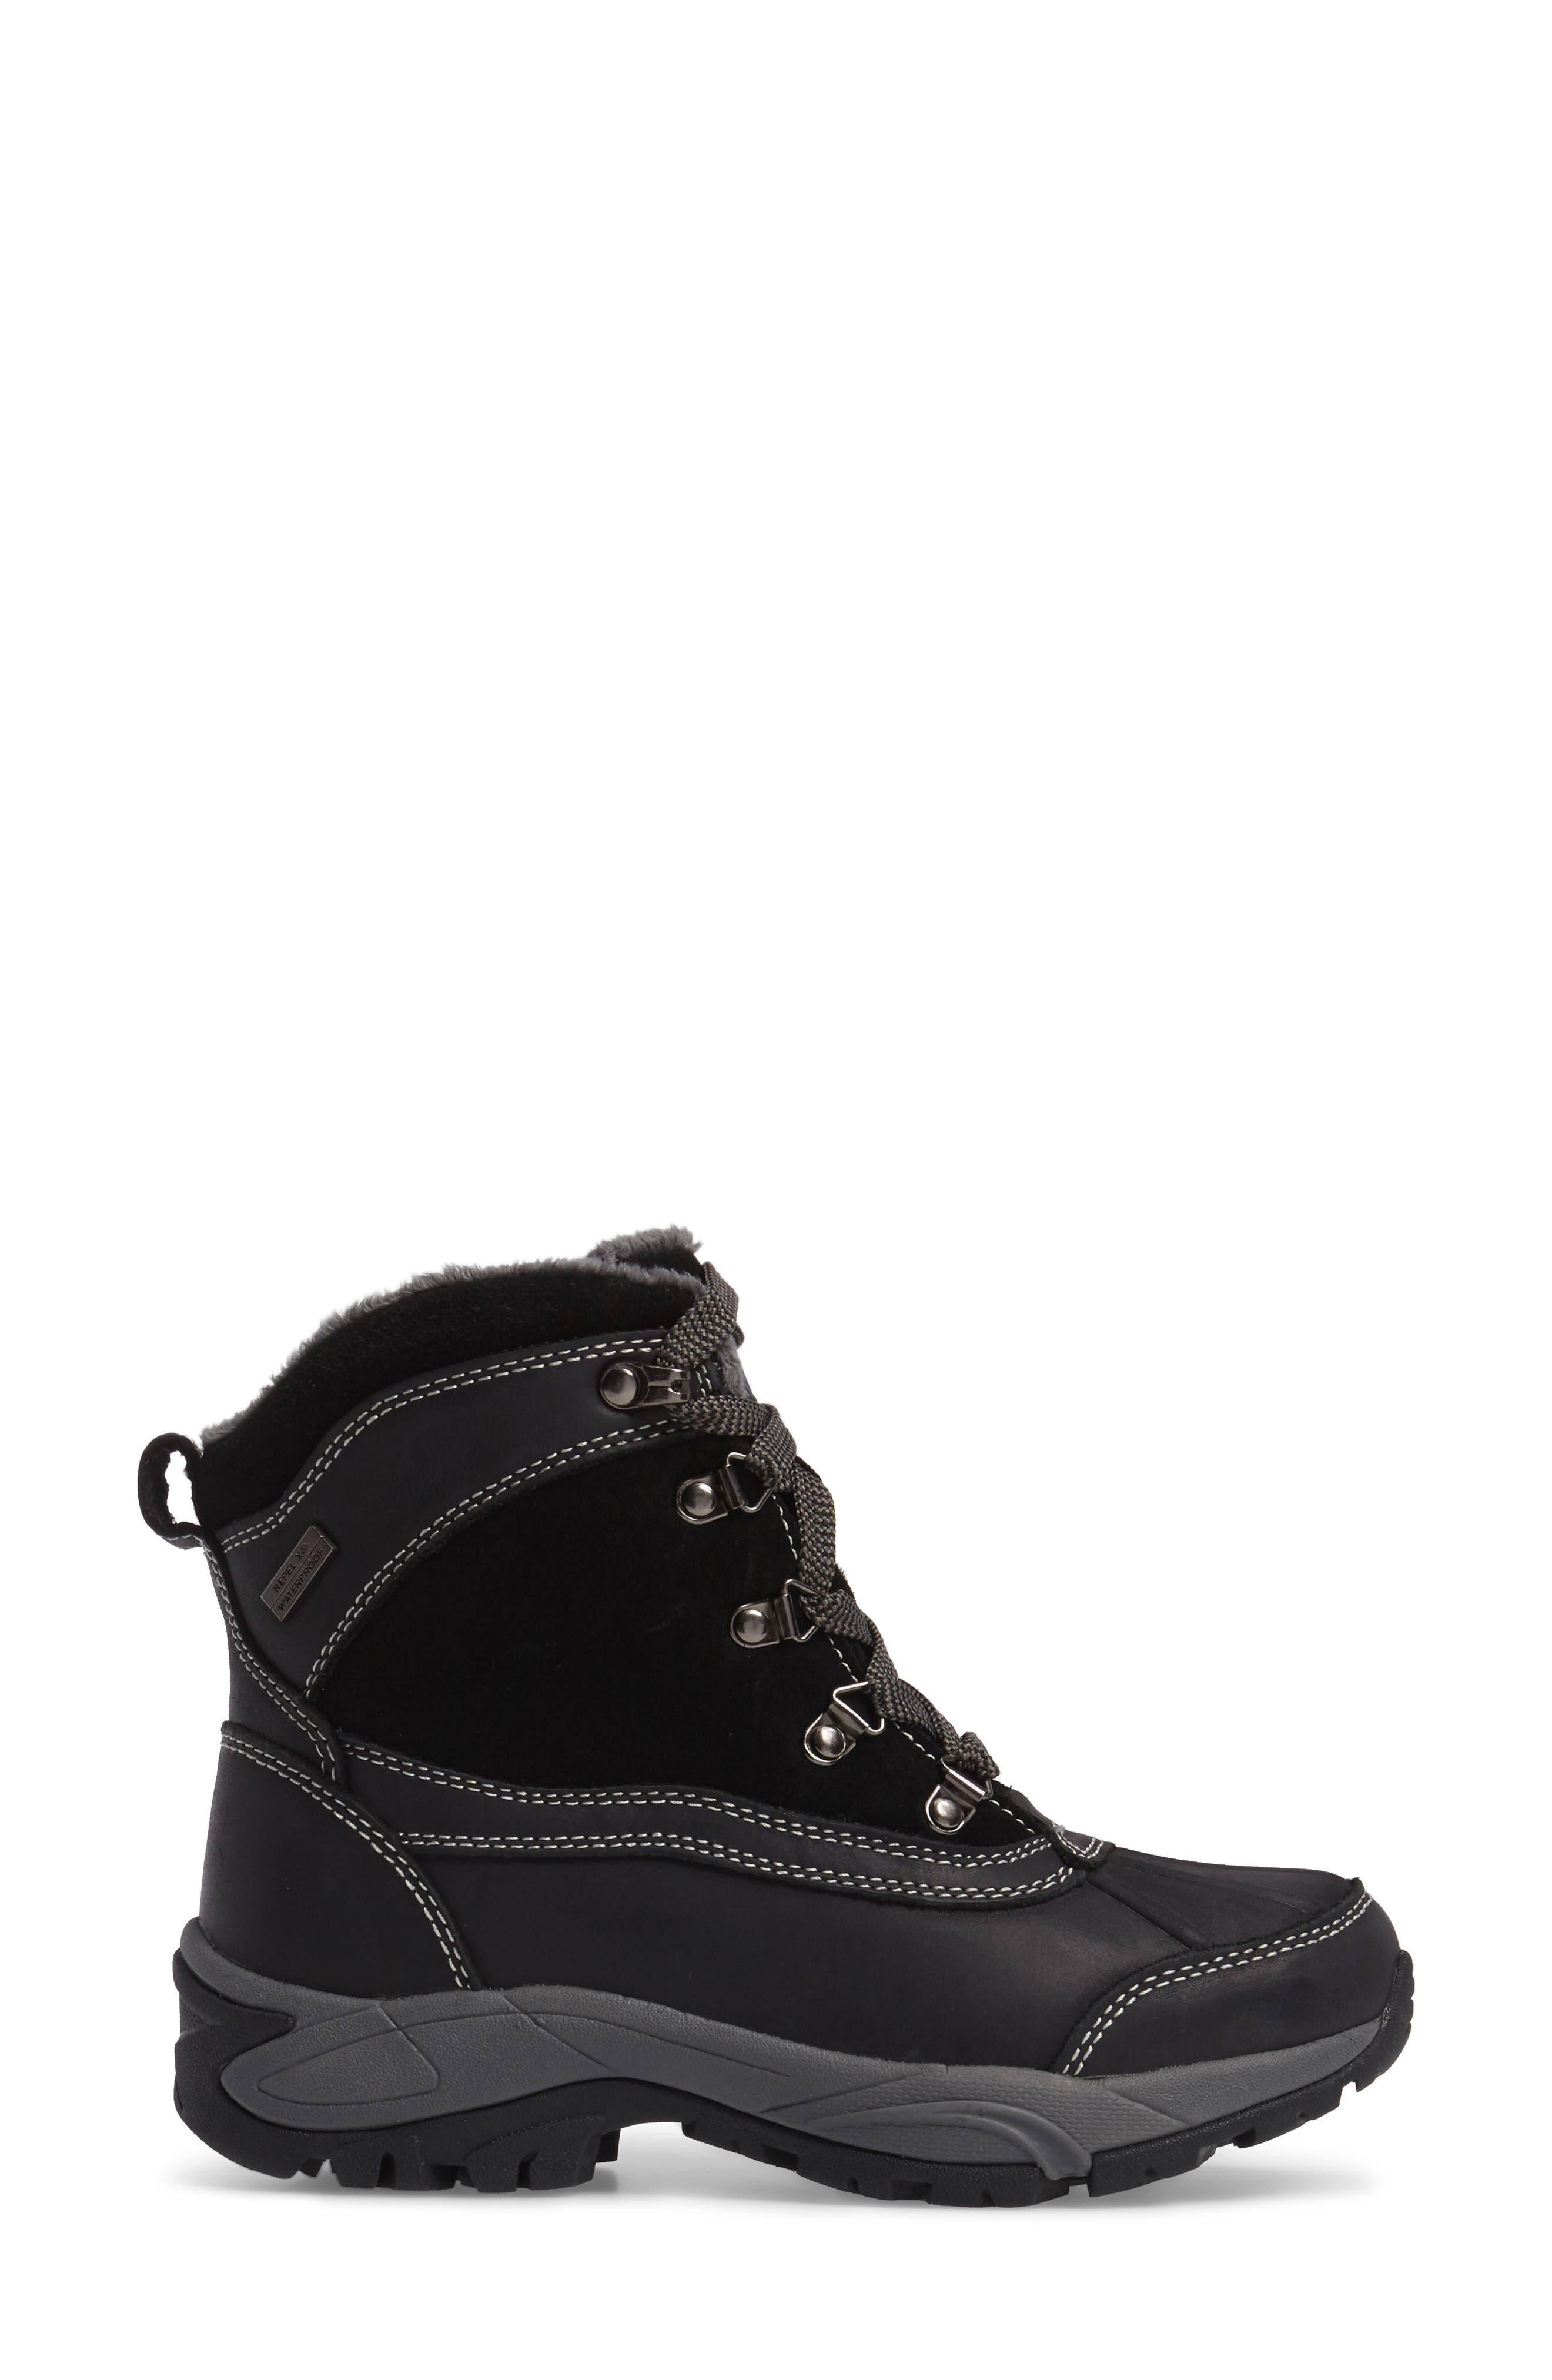 'Renee' Waterproof Insulated Winter Boot,                             Alternate thumbnail 3, color,                             001